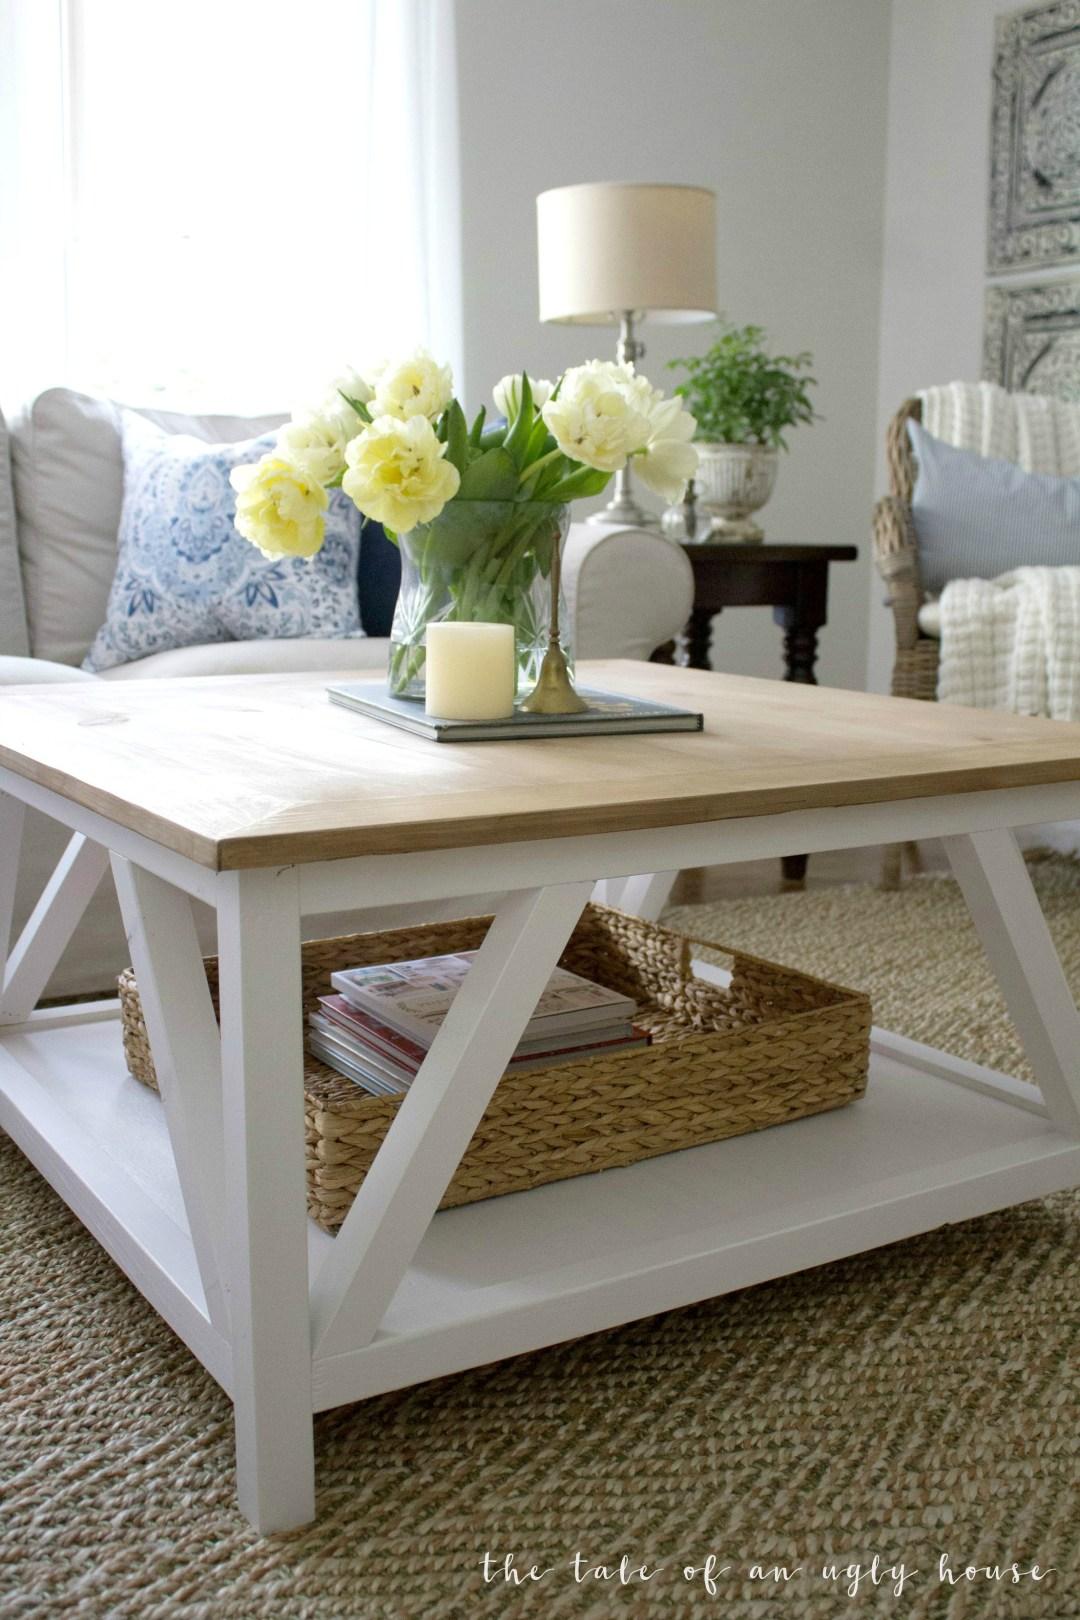 Diy Modern Farmhouse Coffee Table Sincerely Marie Designs